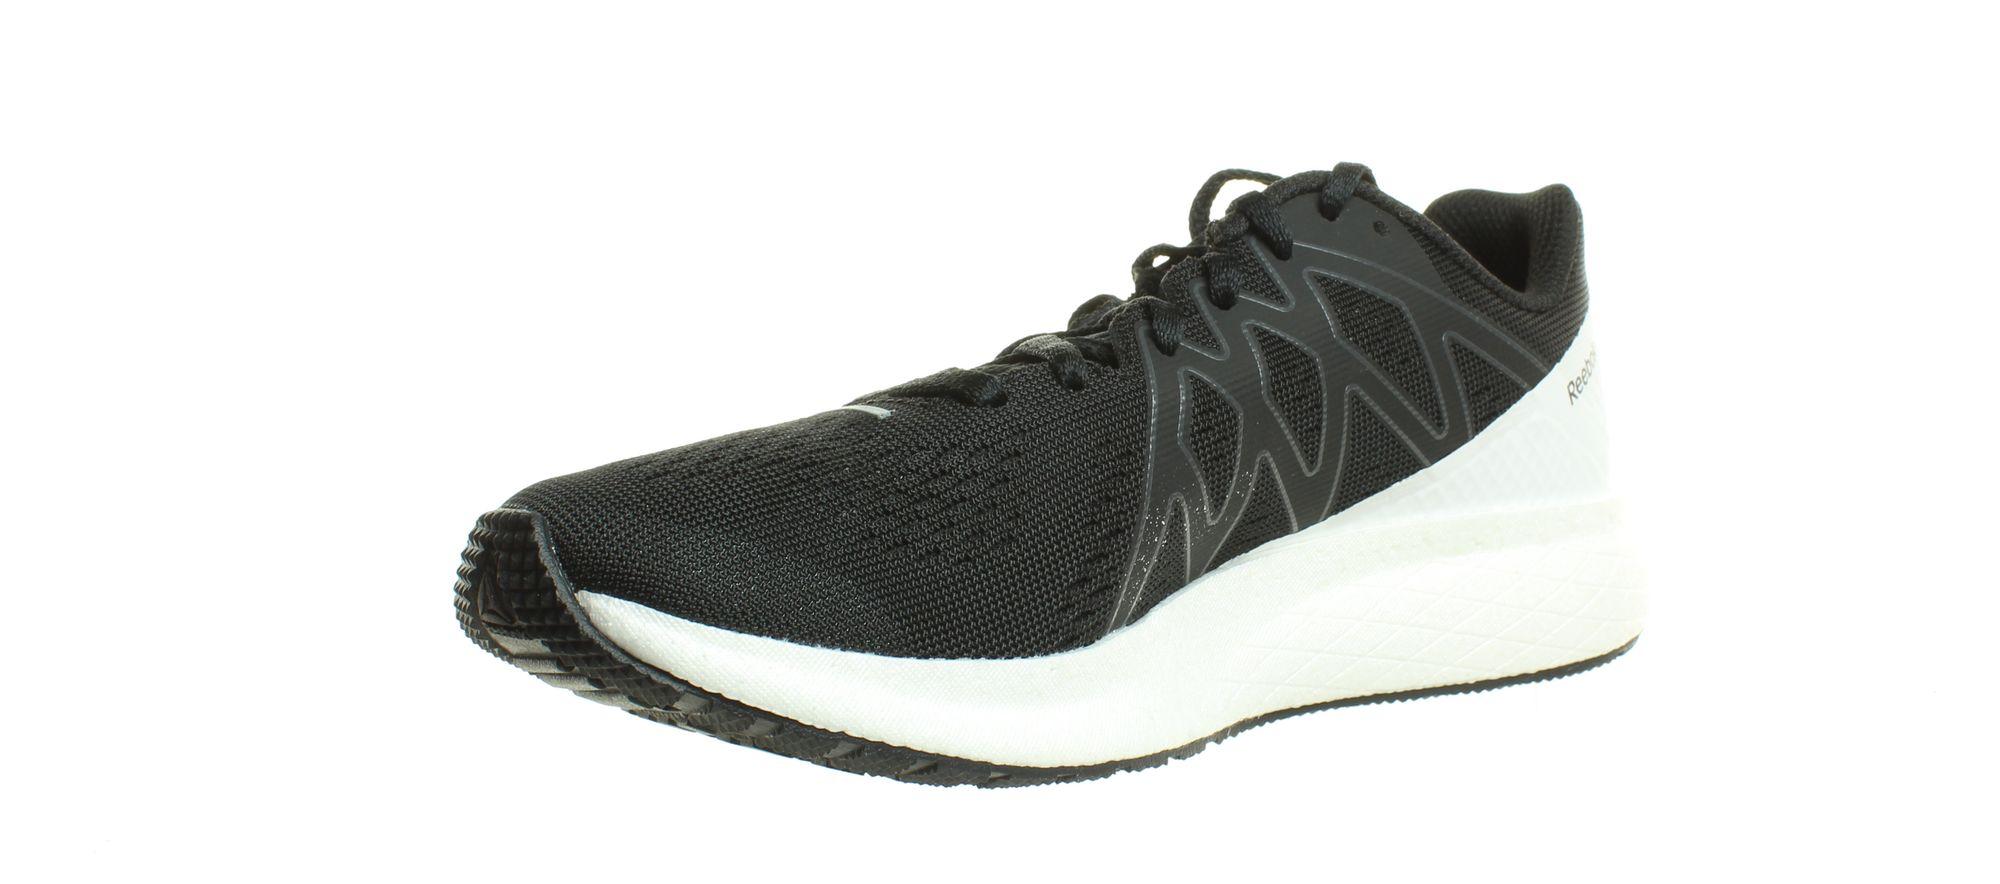 Reebok-Womens-Forever-Floatride-Energy-Running-Shoes thumbnail 11